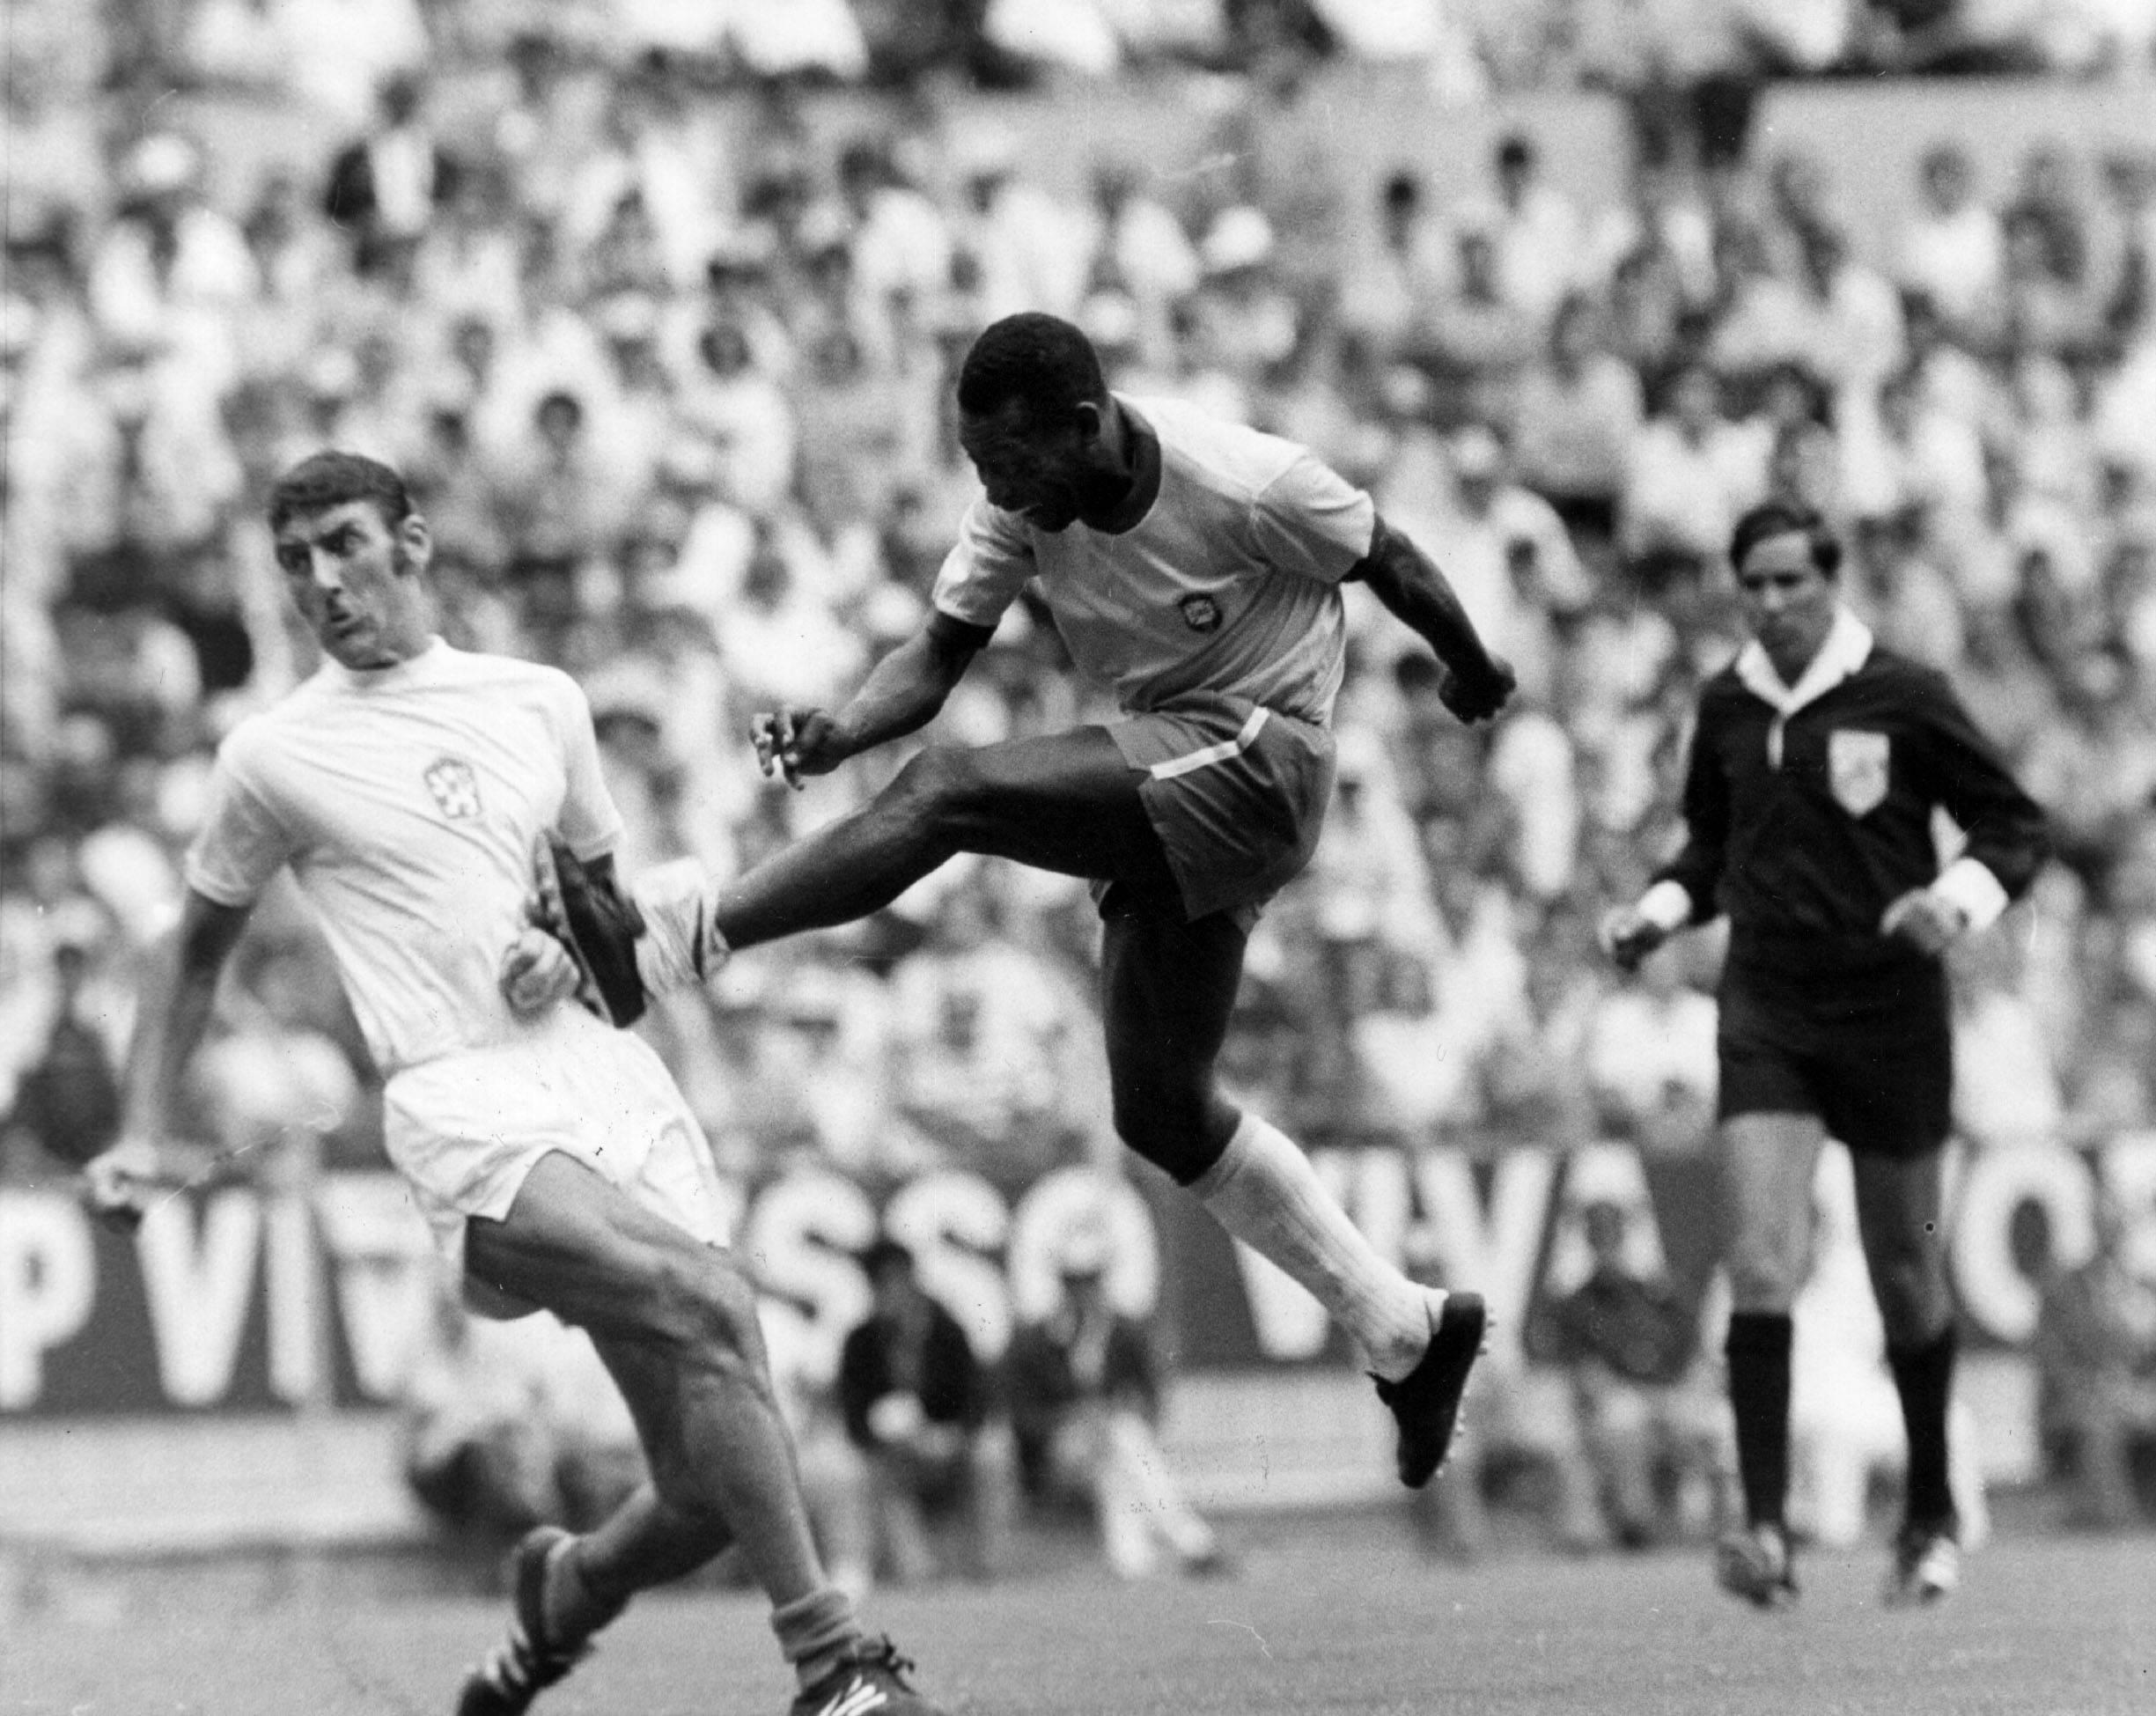 Jorge Barraza: opinión sobre el récord de Cristiano Ronaldo superando a Pelé - Fútbol Internacional - Deportes